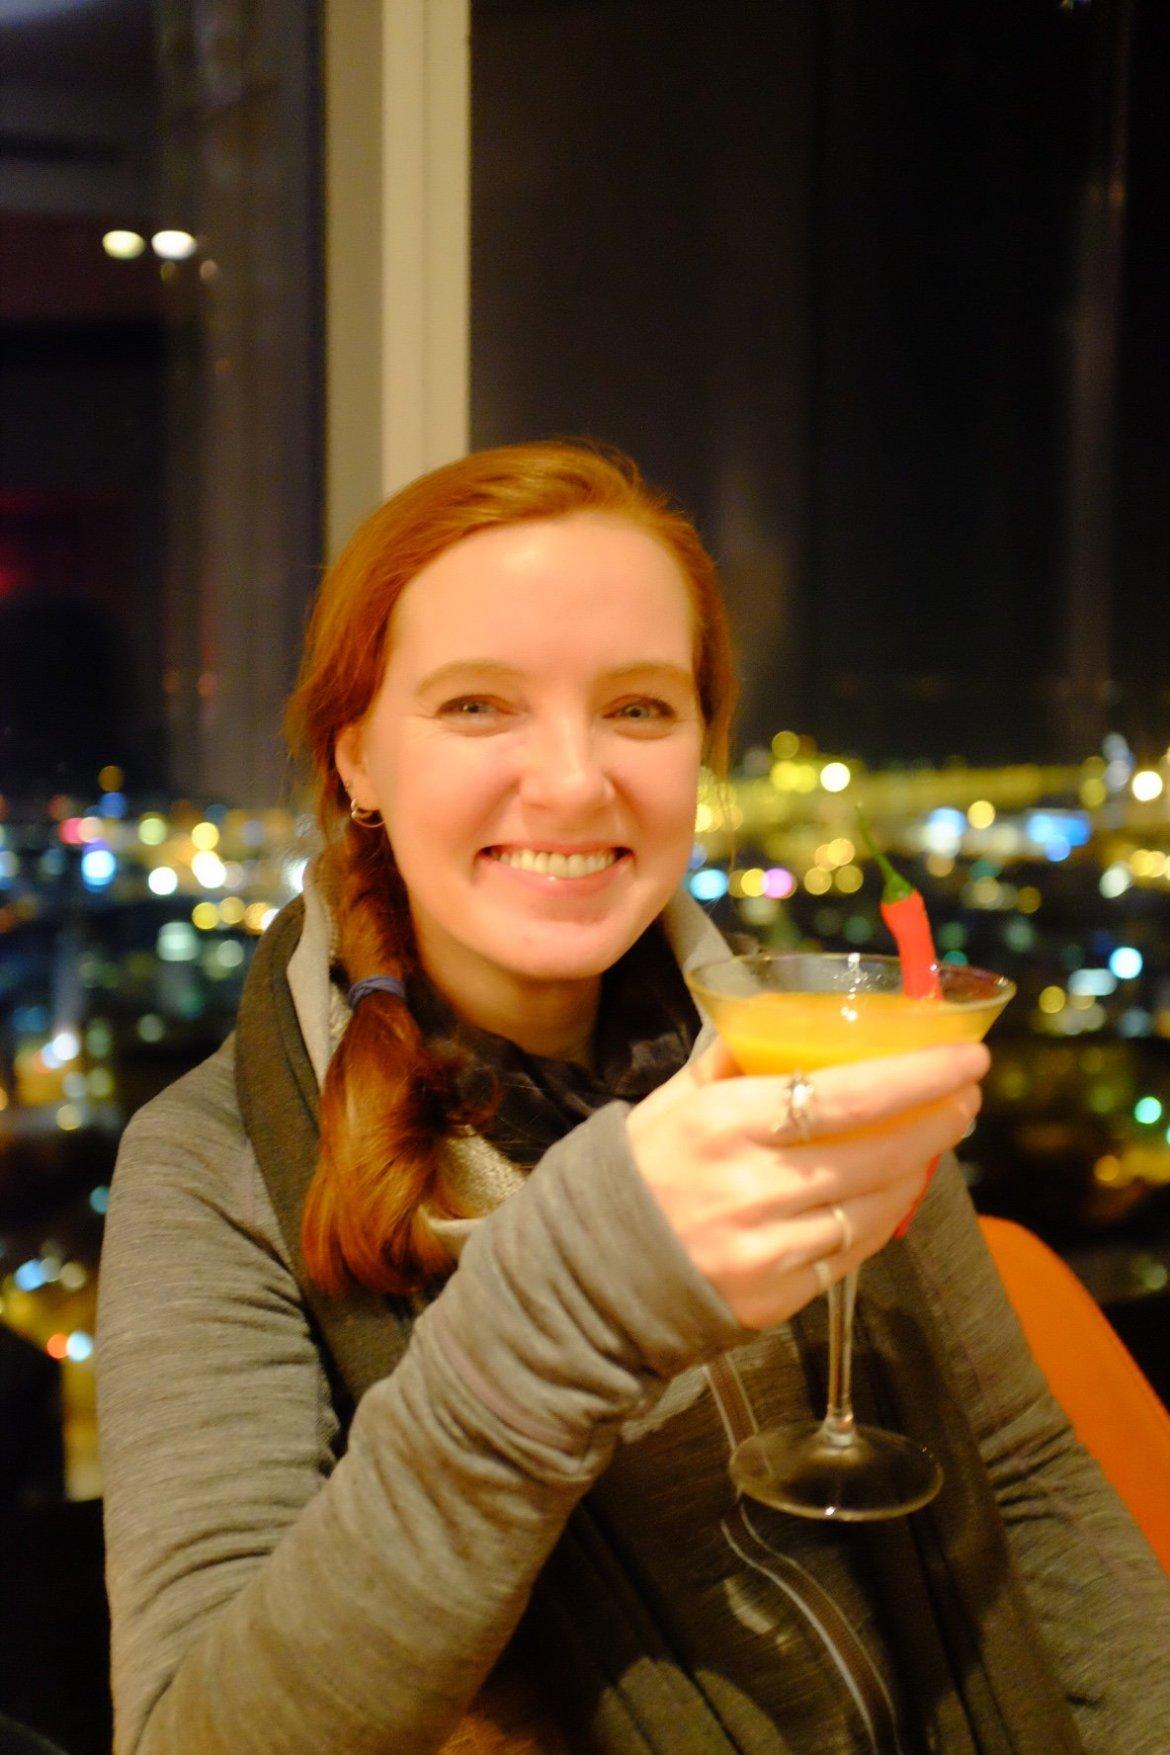 Weekend in Tallinn Sarah drinking a mango chilli coriander Cocktail at the Horisont Bar in Tallinn